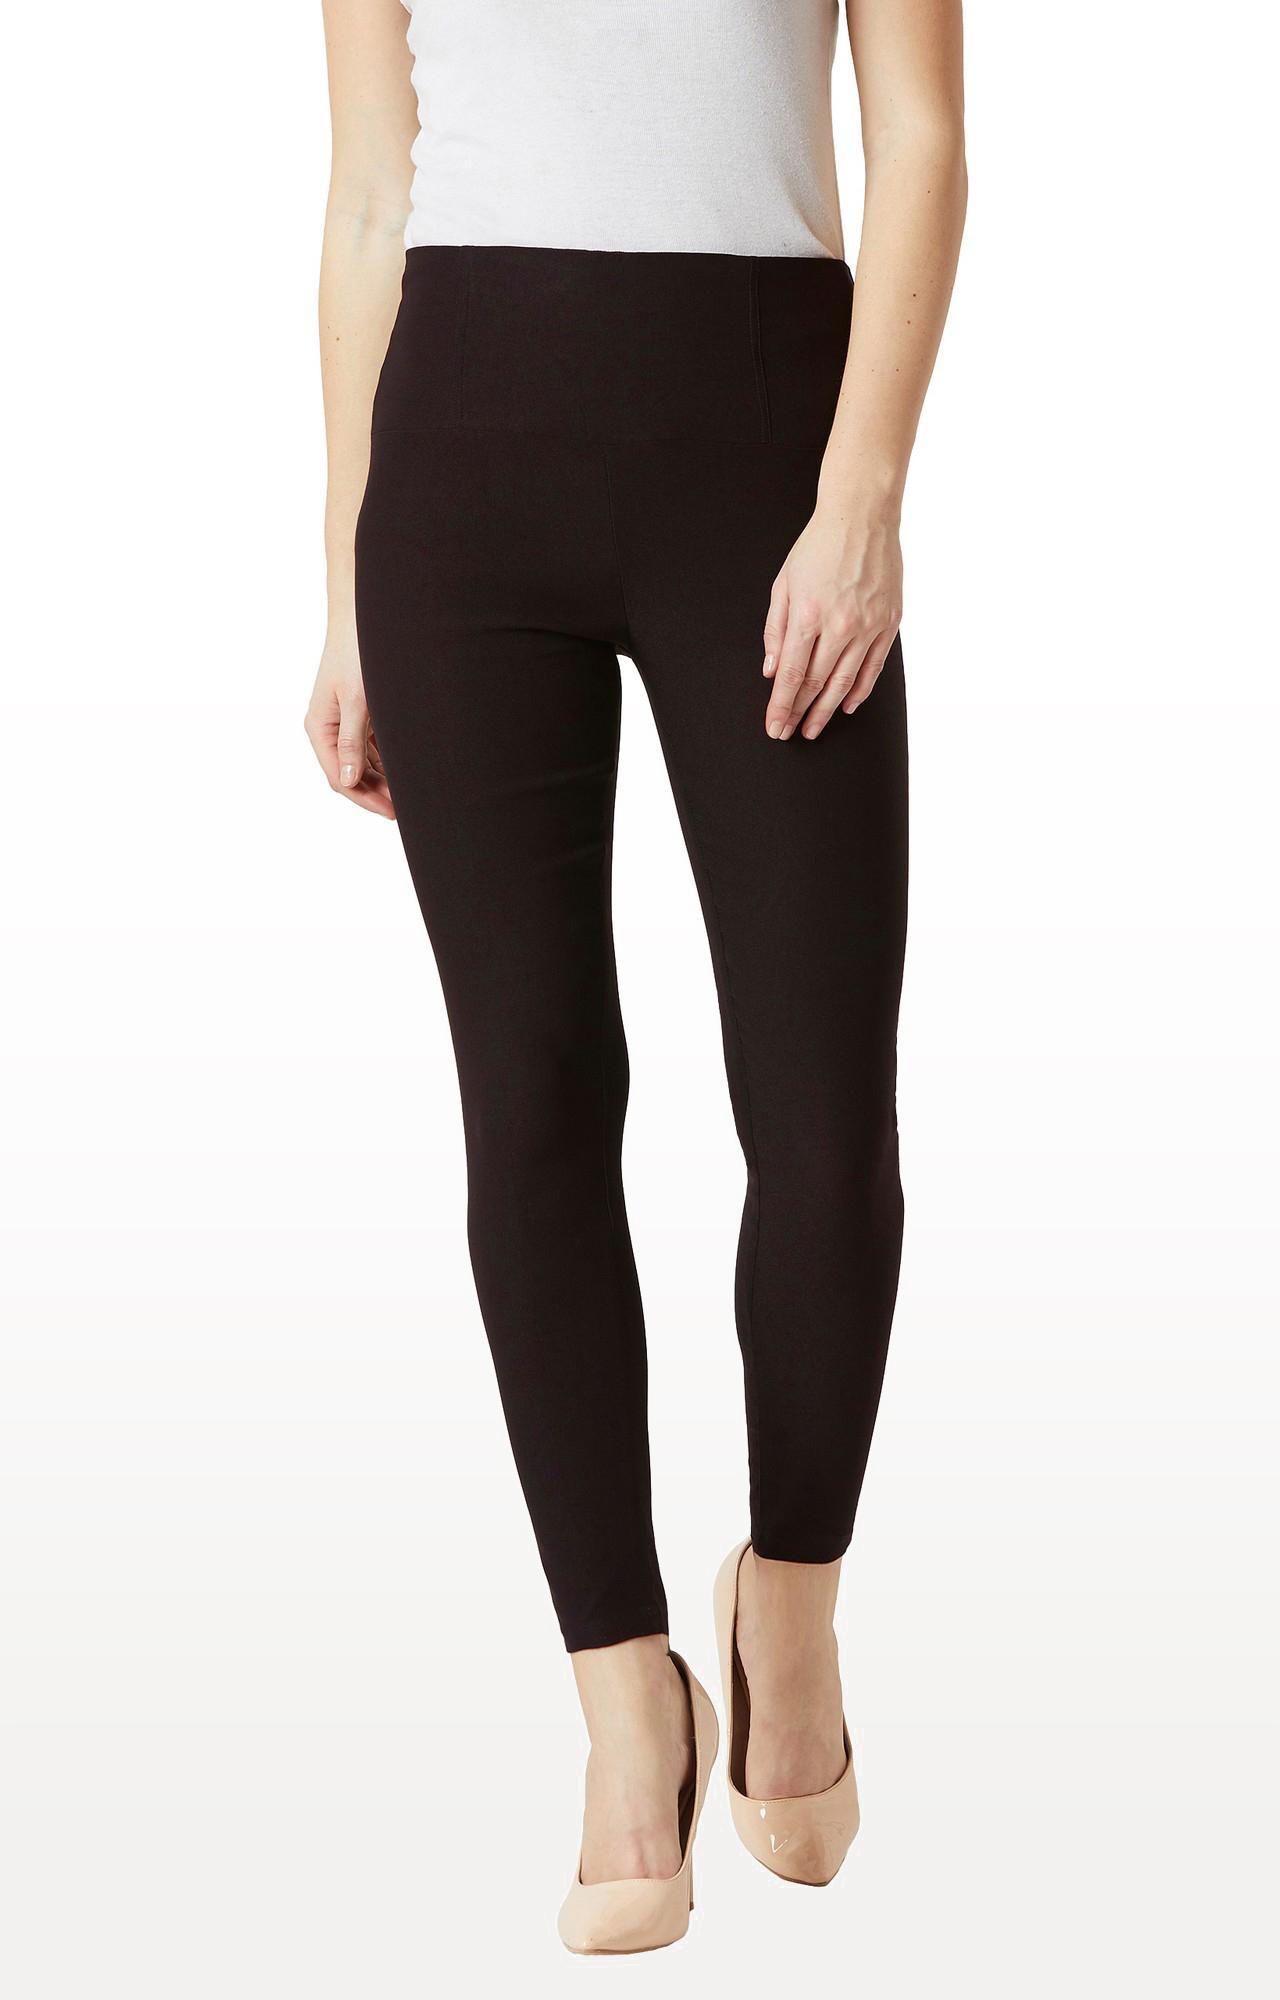 MISS CHASE   Black Solid High Waist Patch Pocket Regular Length Jeggings